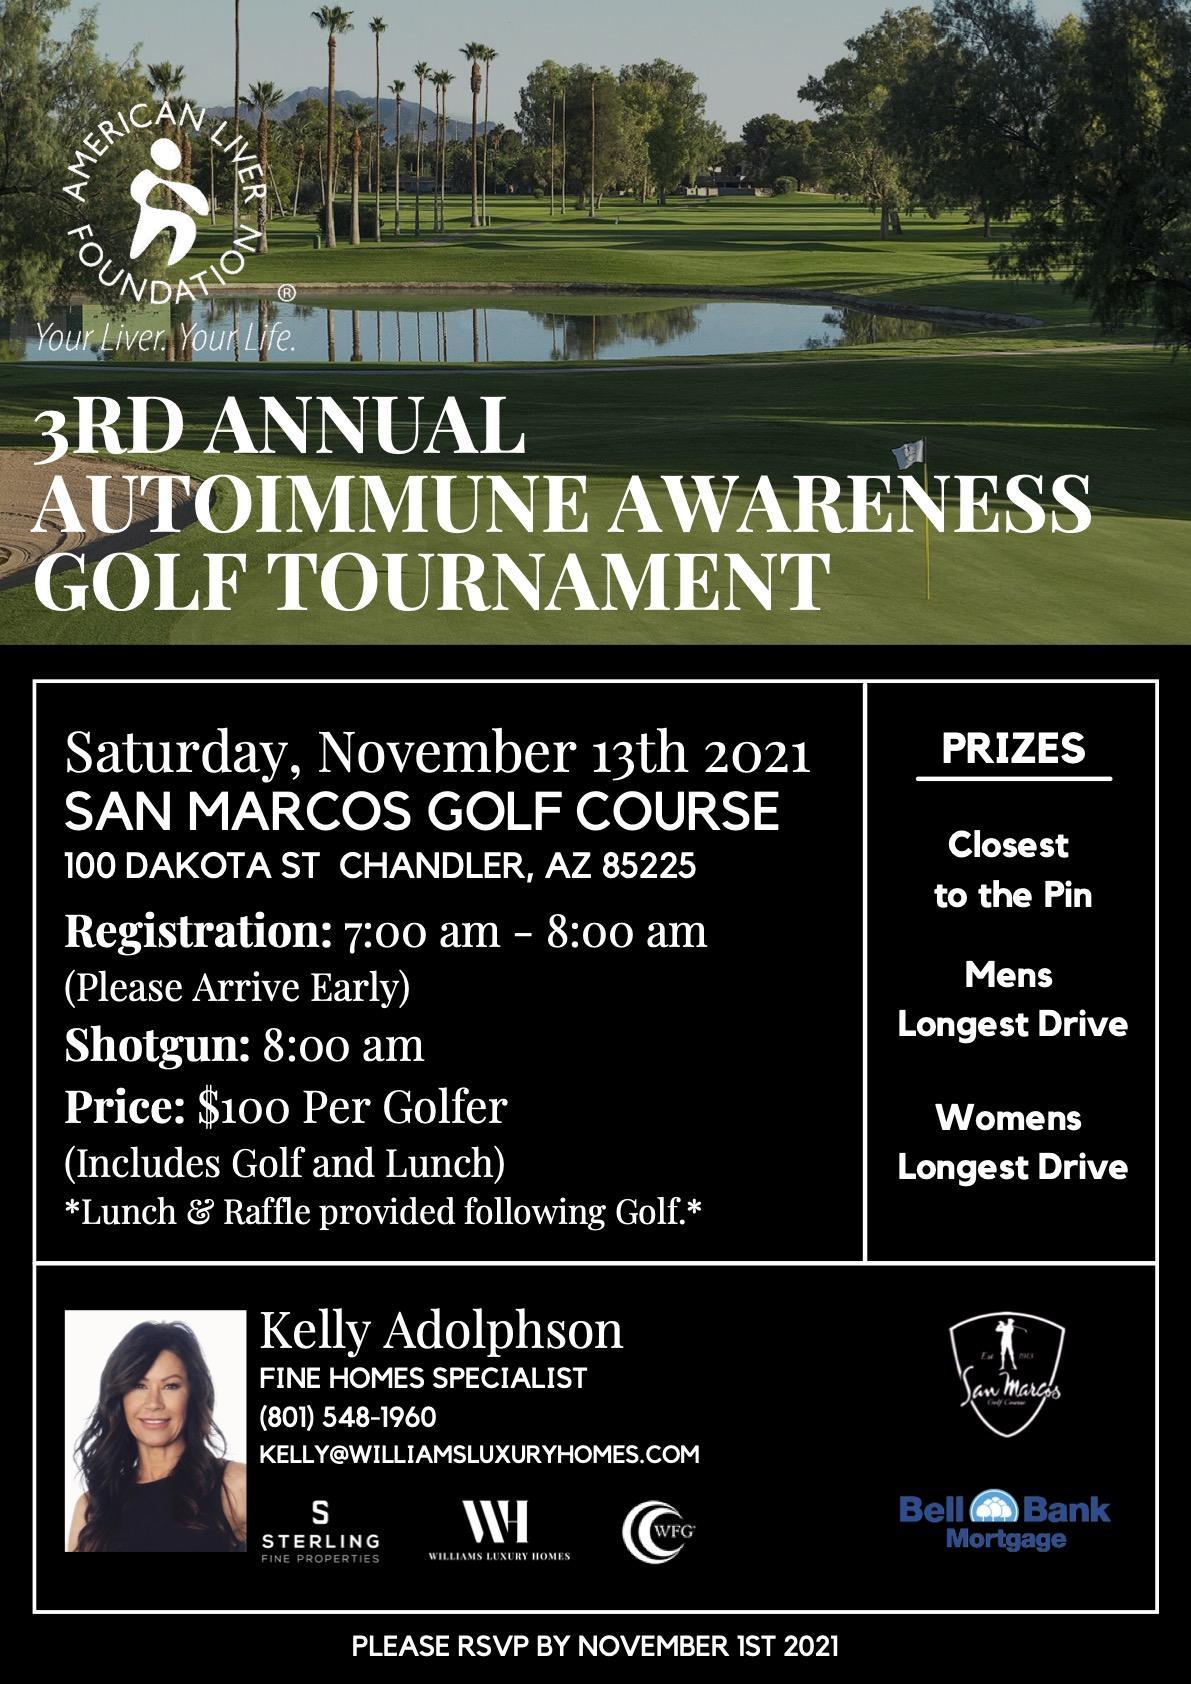 3rd Annual Autoimmune Awareness Golf Tournament